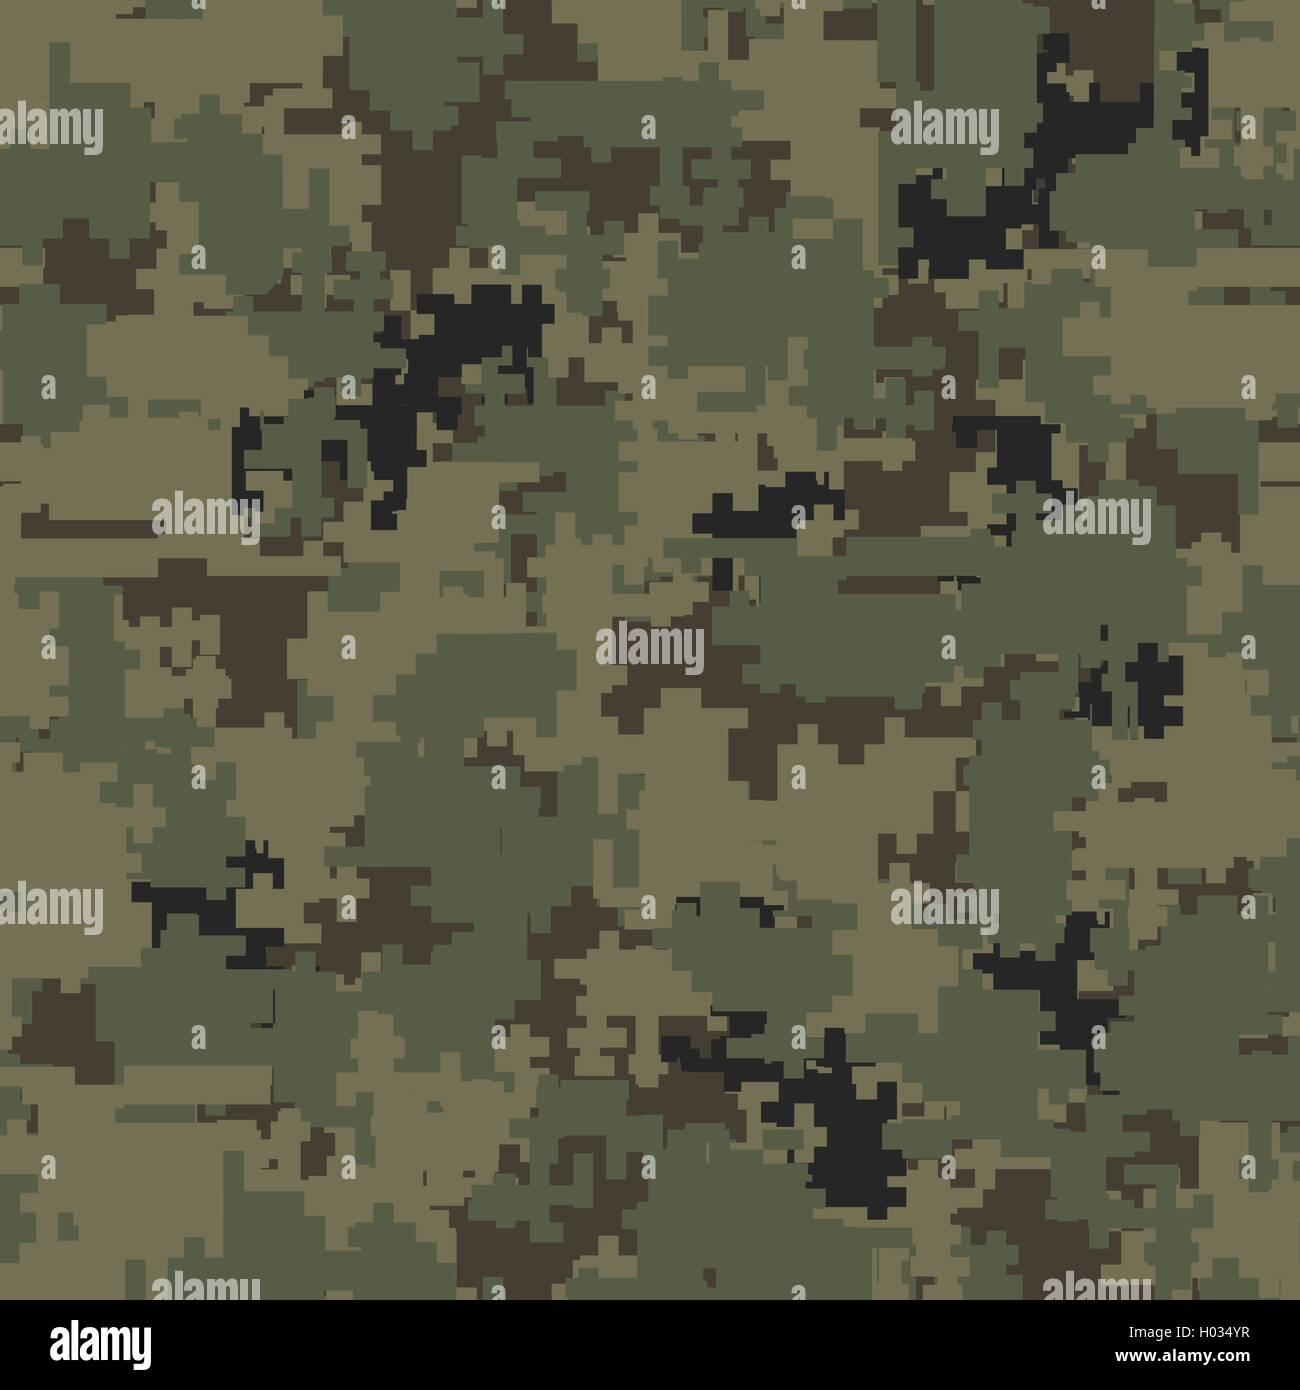 Digital camouflage seamless patterns - Stock Image